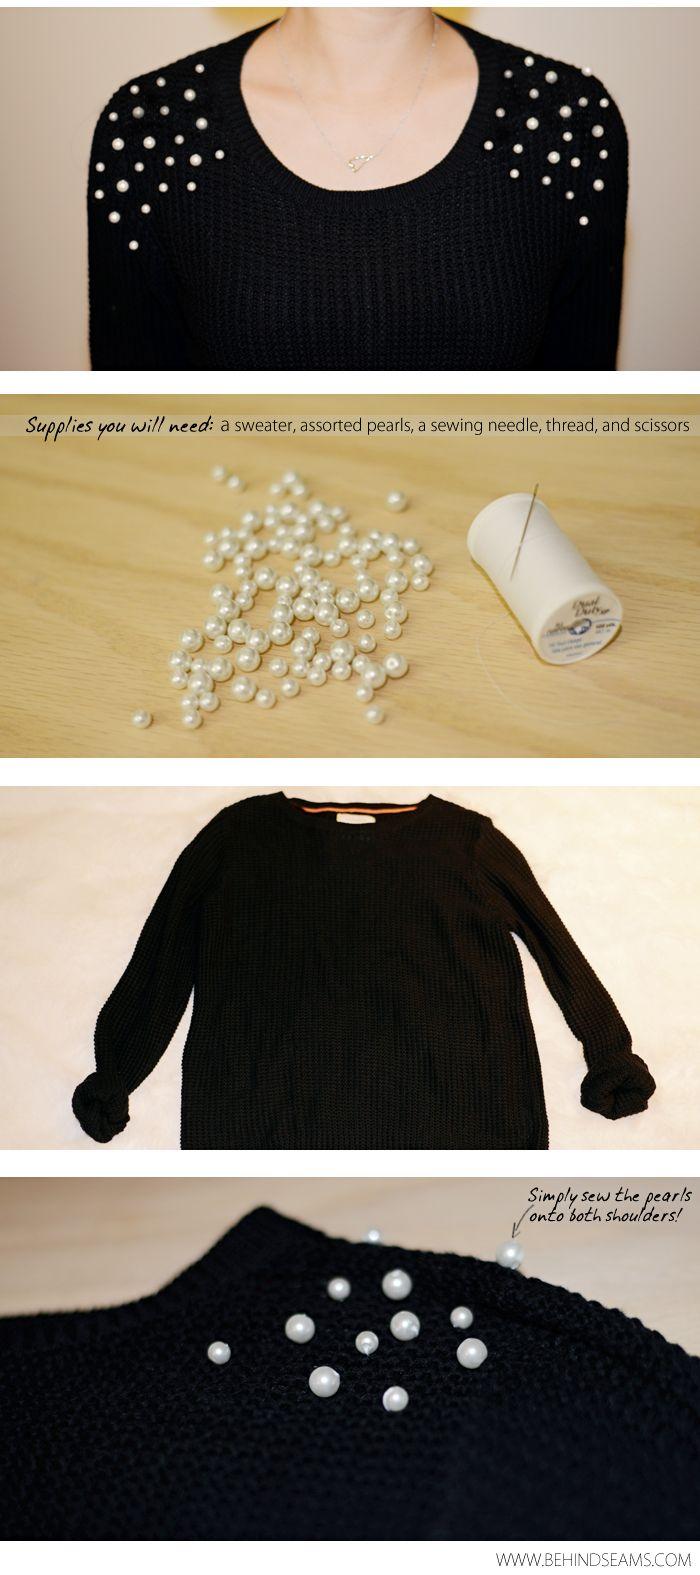 DIY: Pearl Embellished Shoulders http://www.bloglovin.com/blog/post/6879765/2636051251?link=aHR0cCUzQSUyRiUyRnd3dy5iZWhpbmRzZWFtcy5jb20lMkYyMDE0JTJGMDQlMkZkaXktcGVhcmwtZW1iZWxsaXNoZWQtc2hvdWxkZXJzLmh0bWw=